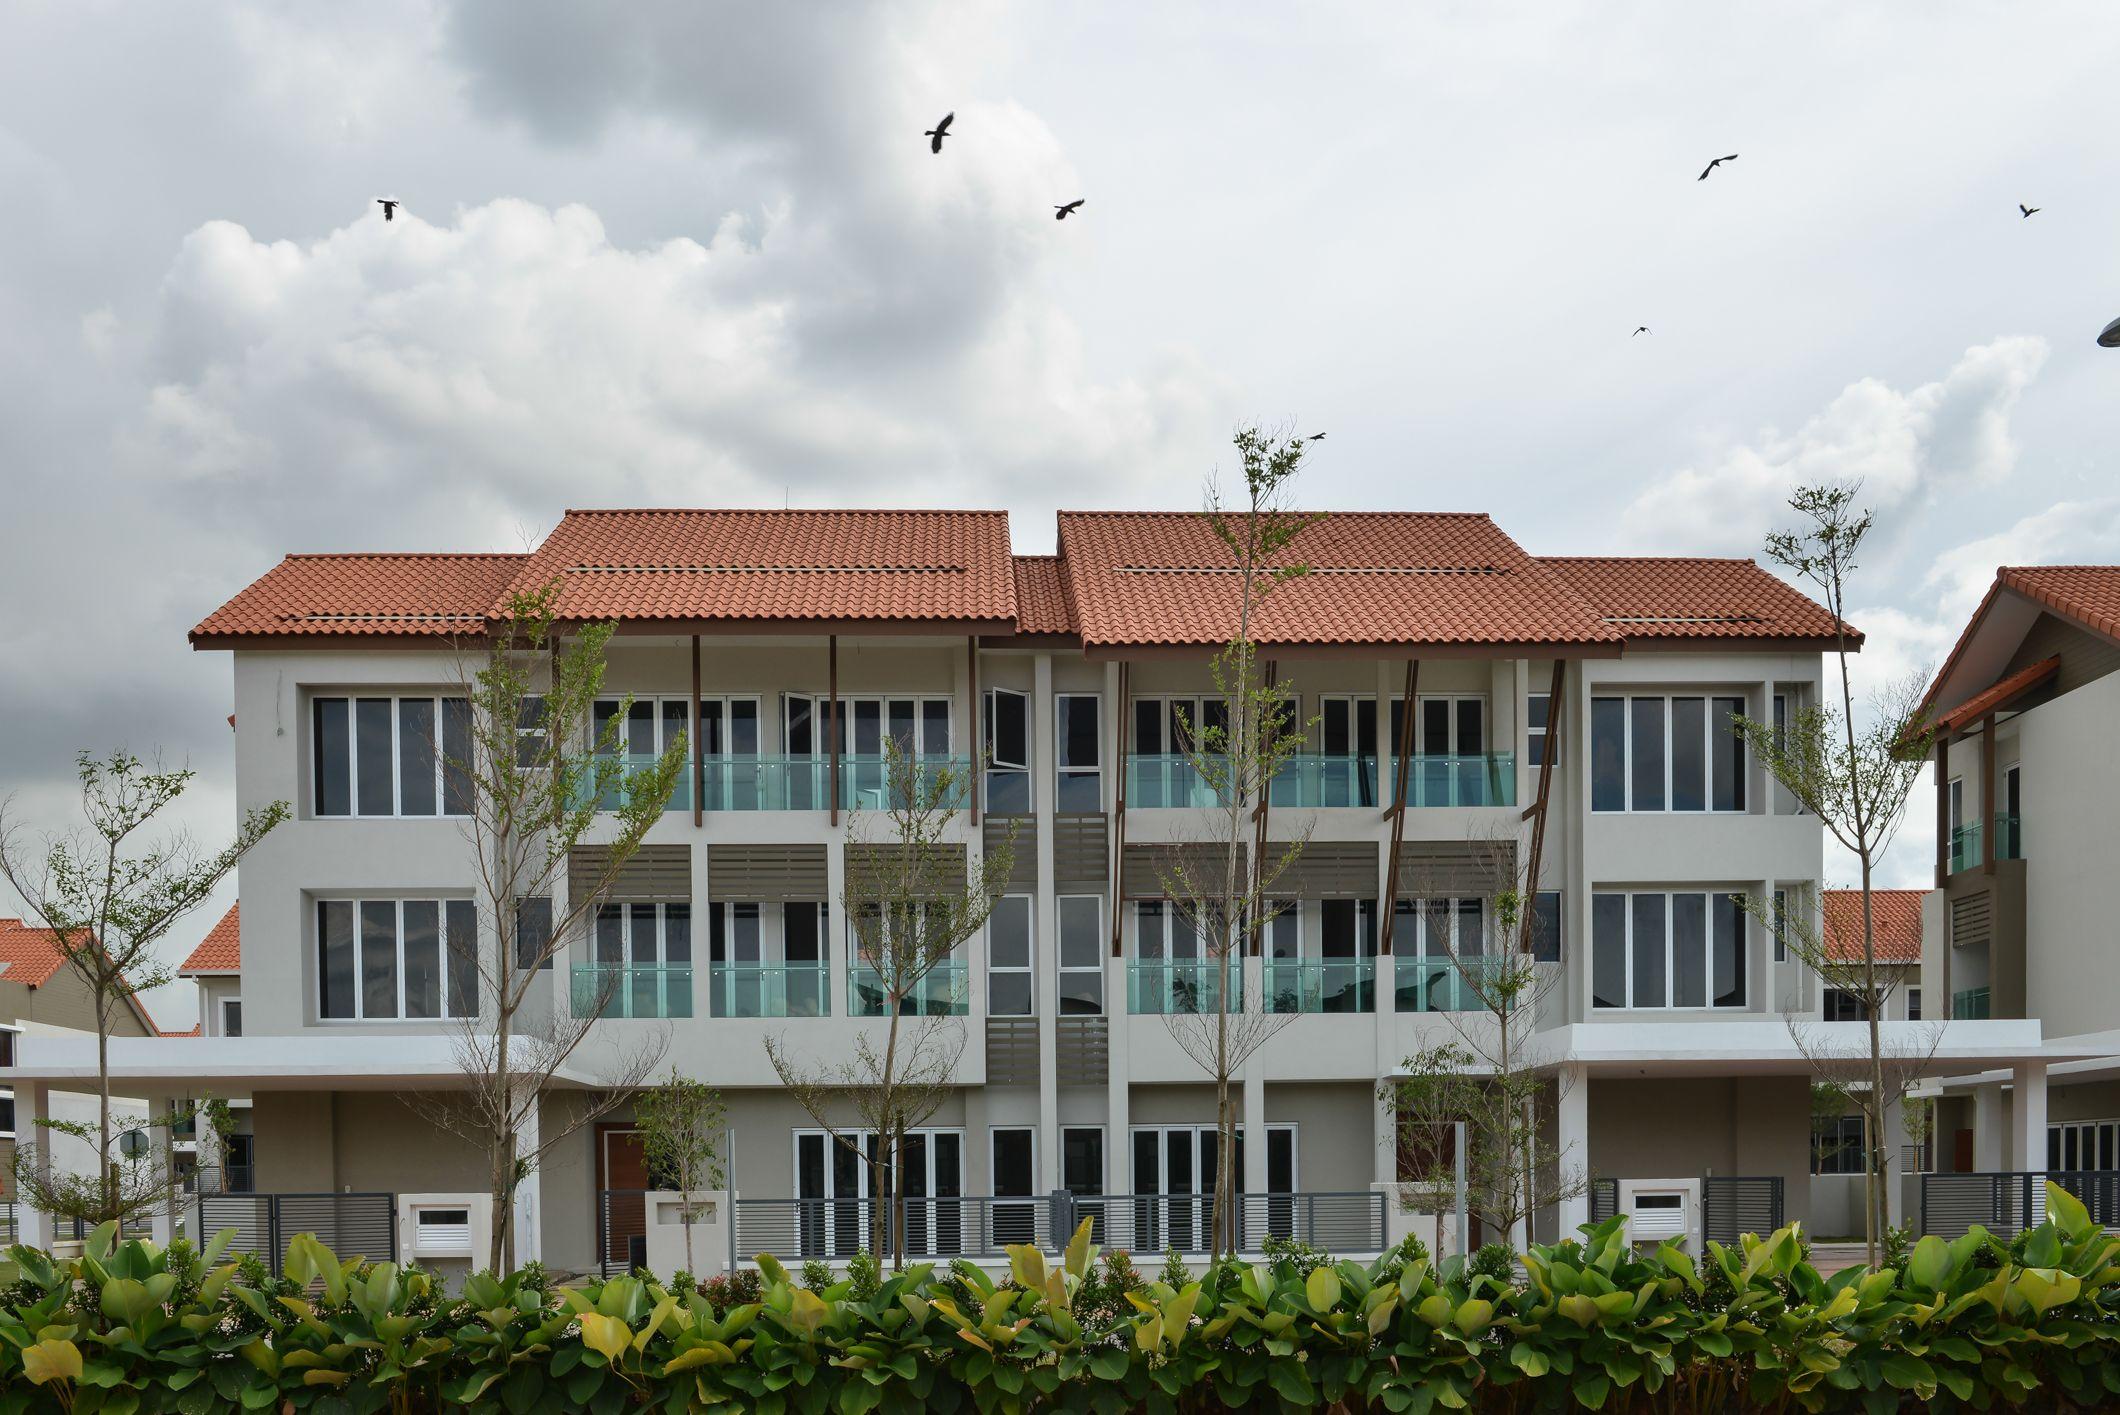 A Renaissance Piazza Modern Portuguese Minimalism Decorismo Weekend House Building Exterior Courtyard House